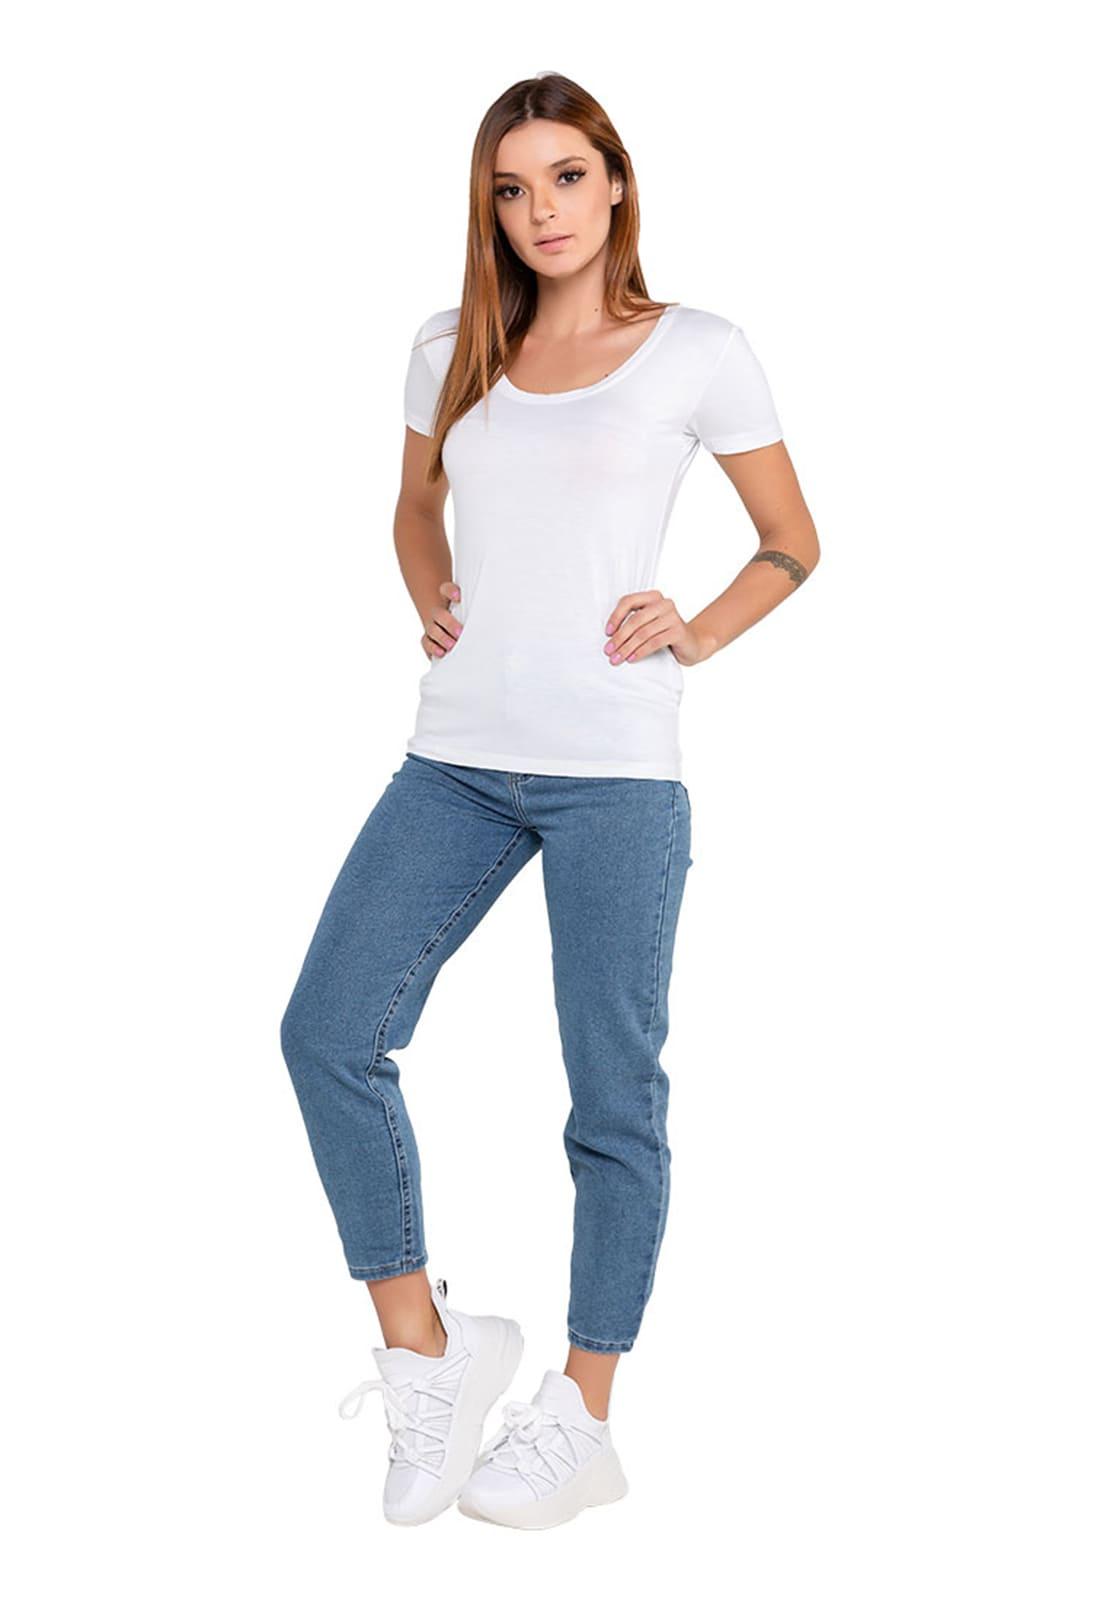 2 Camisetas Básicas Feminina -  Cores Preto e Branco